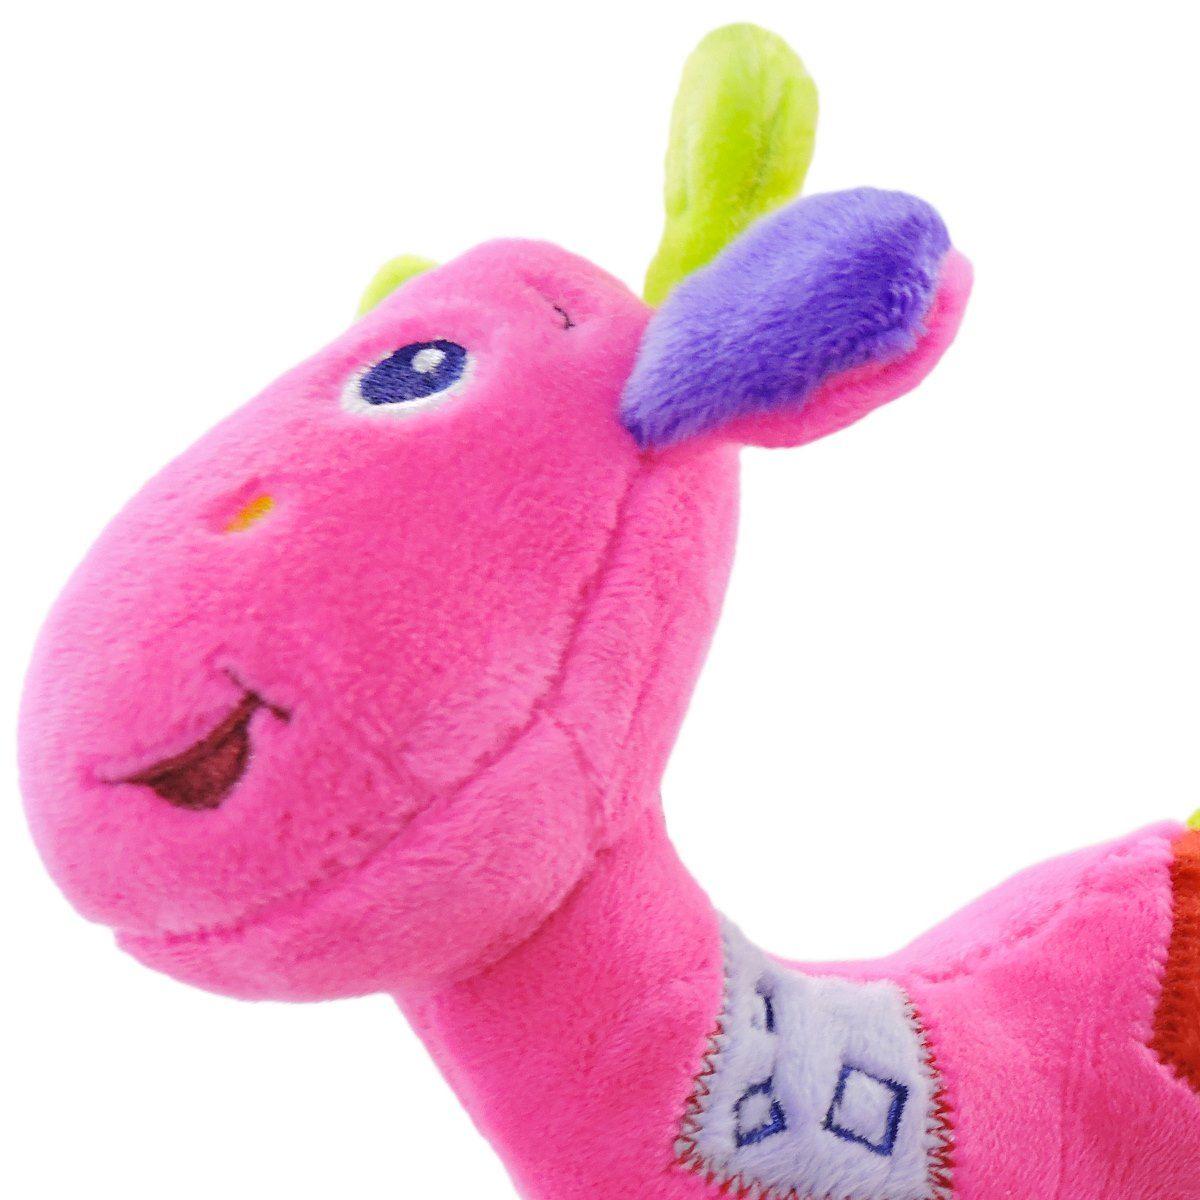 Pelúcia Girafa Com Chocalho Infantil Girafa Rosa - Unik Toys